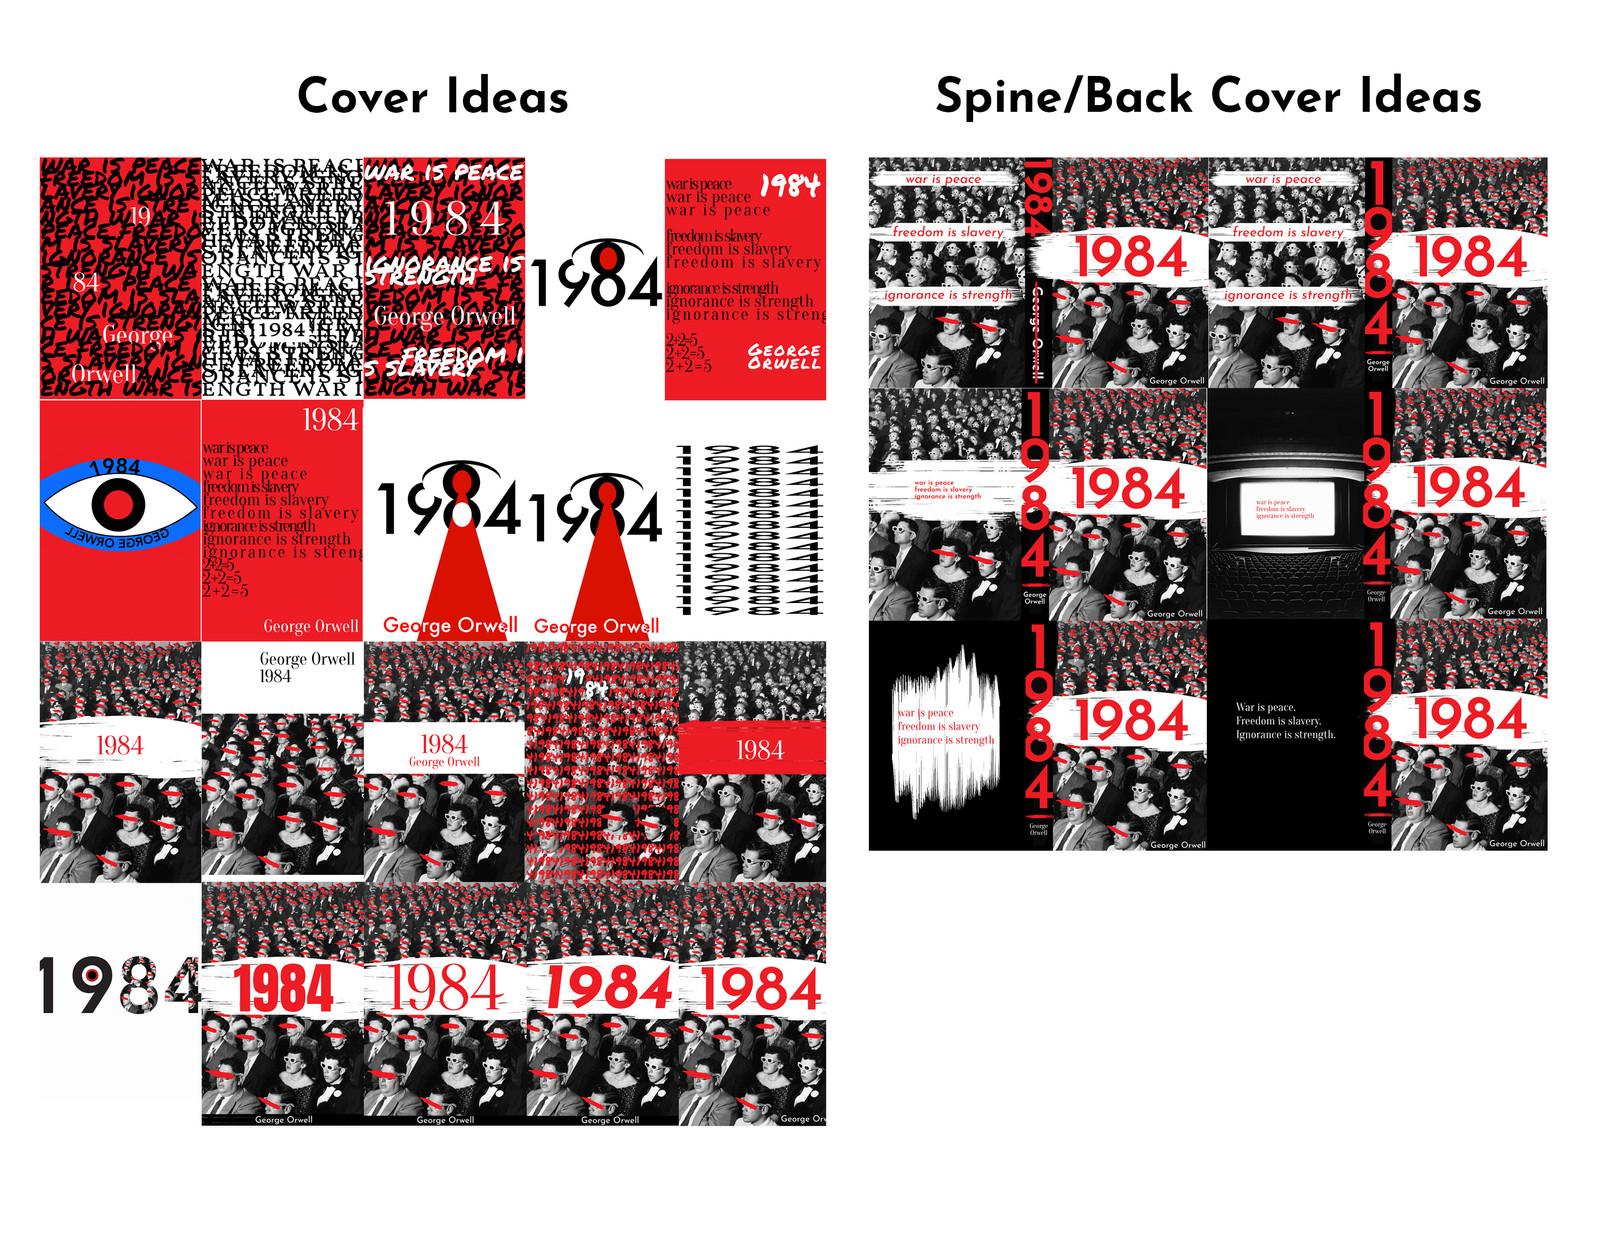 Sabsommerportfolio 1984 Book Cover Redesign